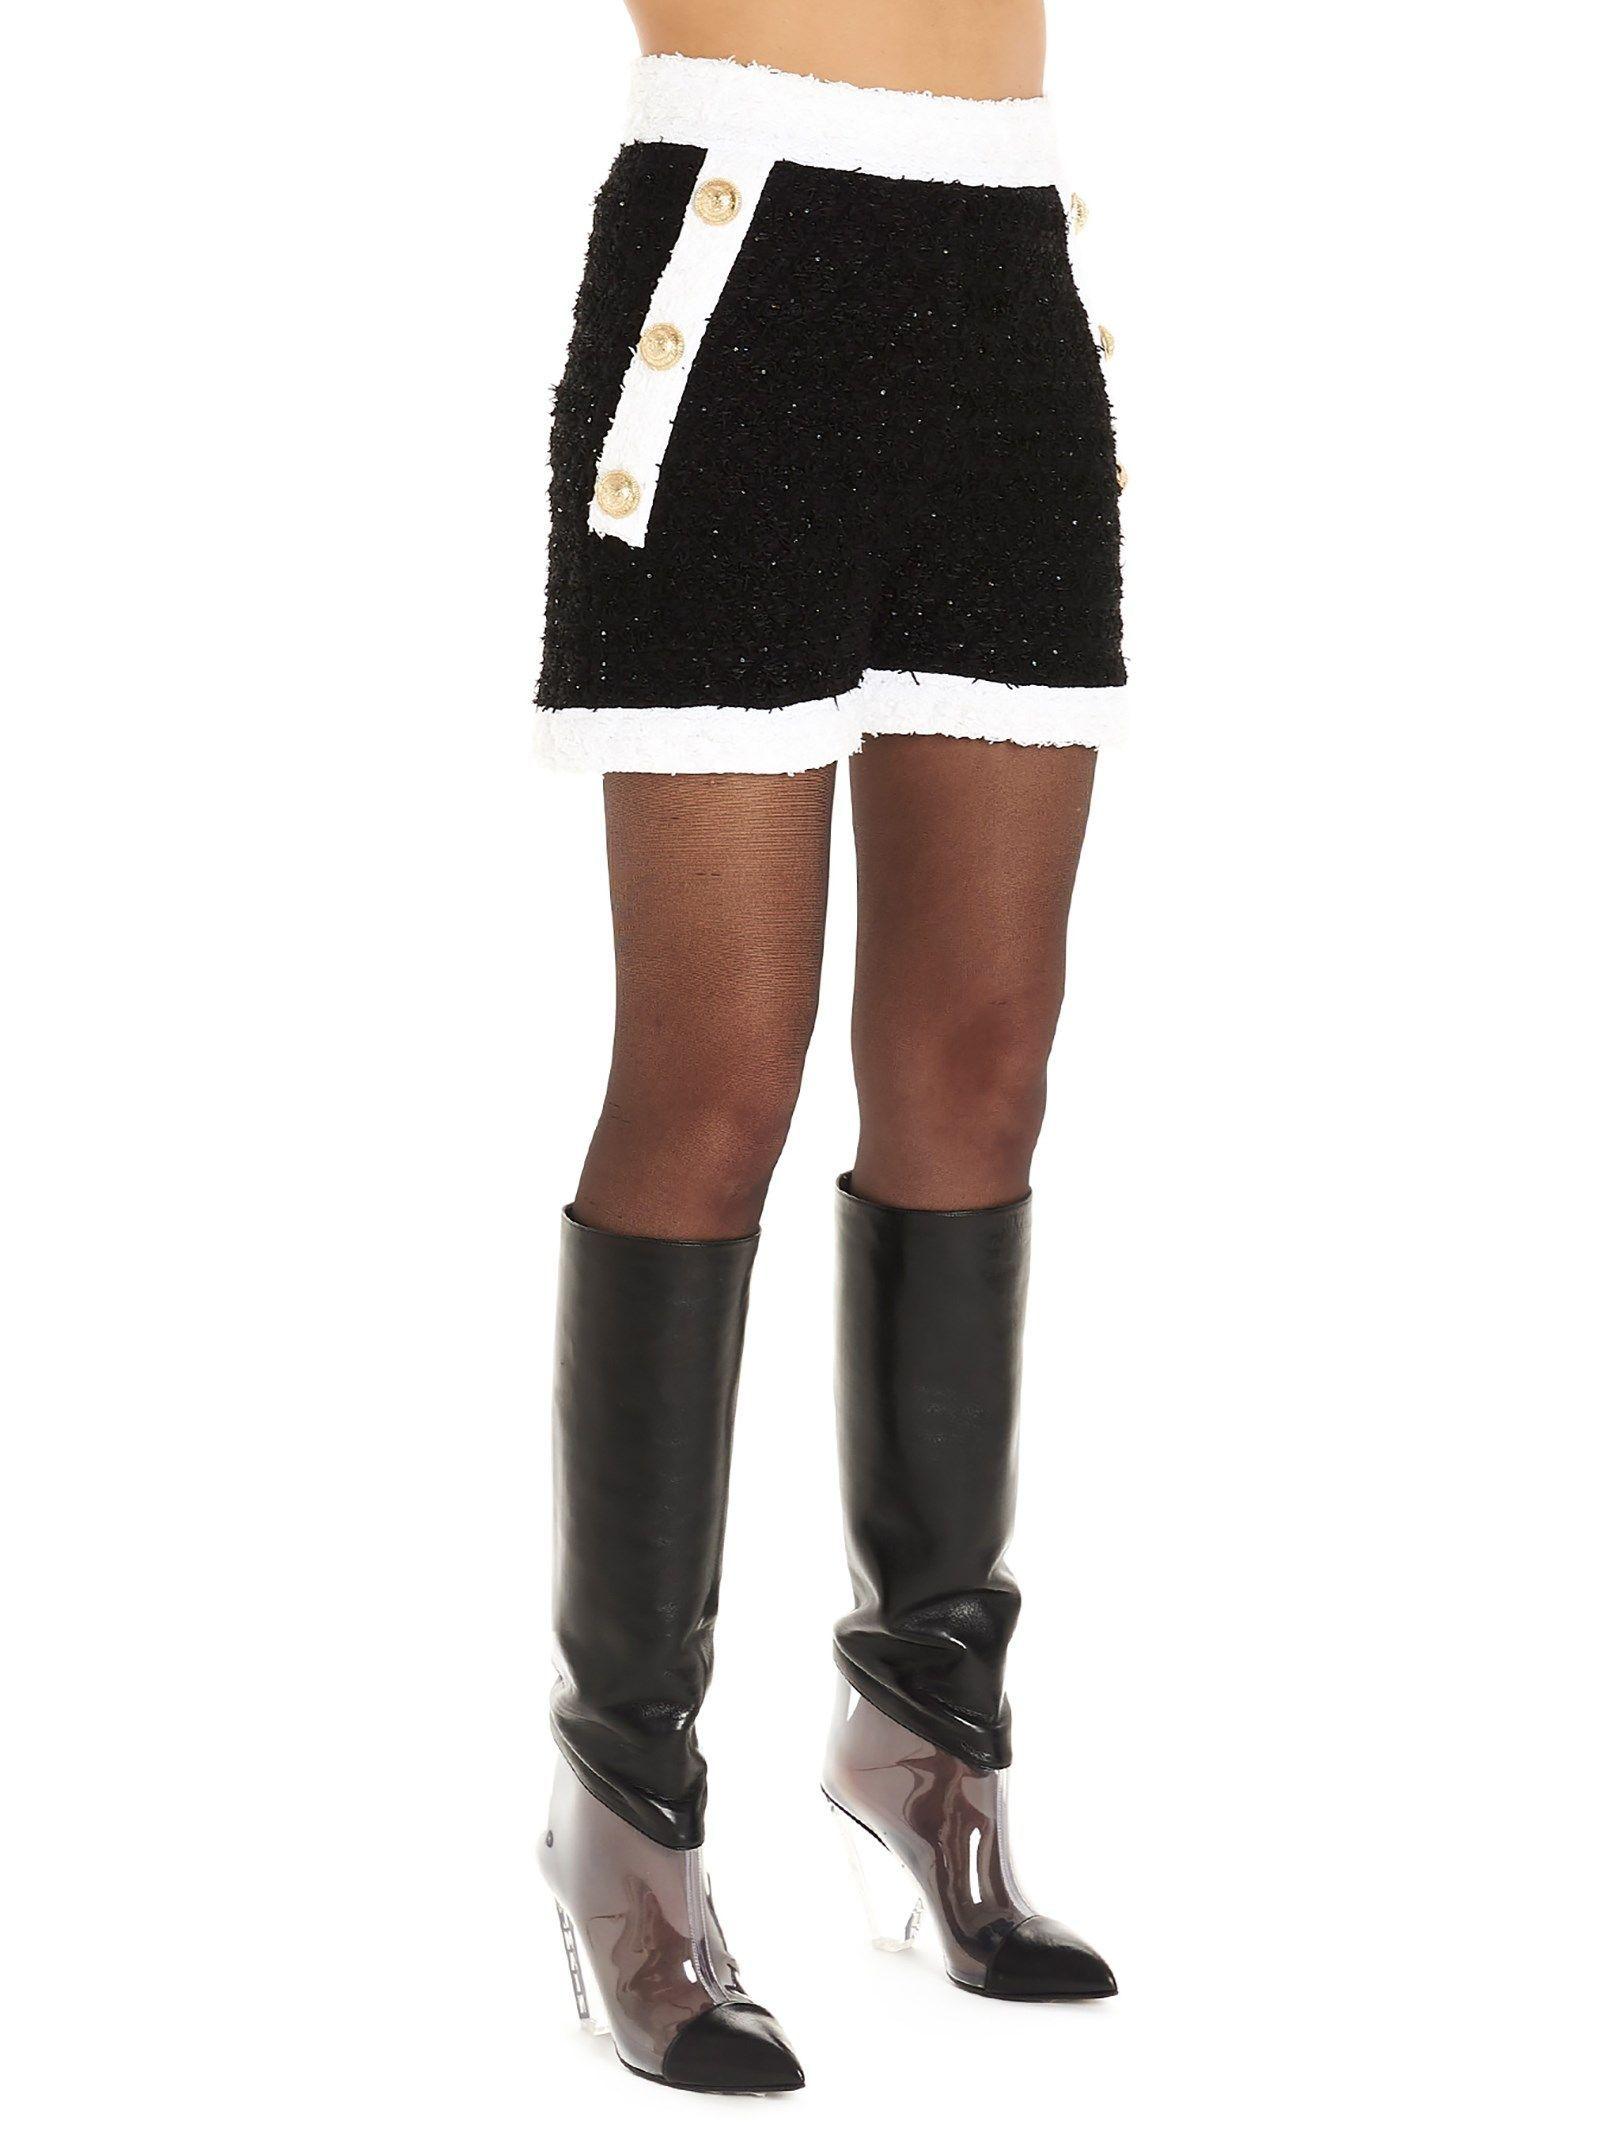 BALMAIN WOMEN'S SF15040K470EAB BLACK VISCOSE SHORTS